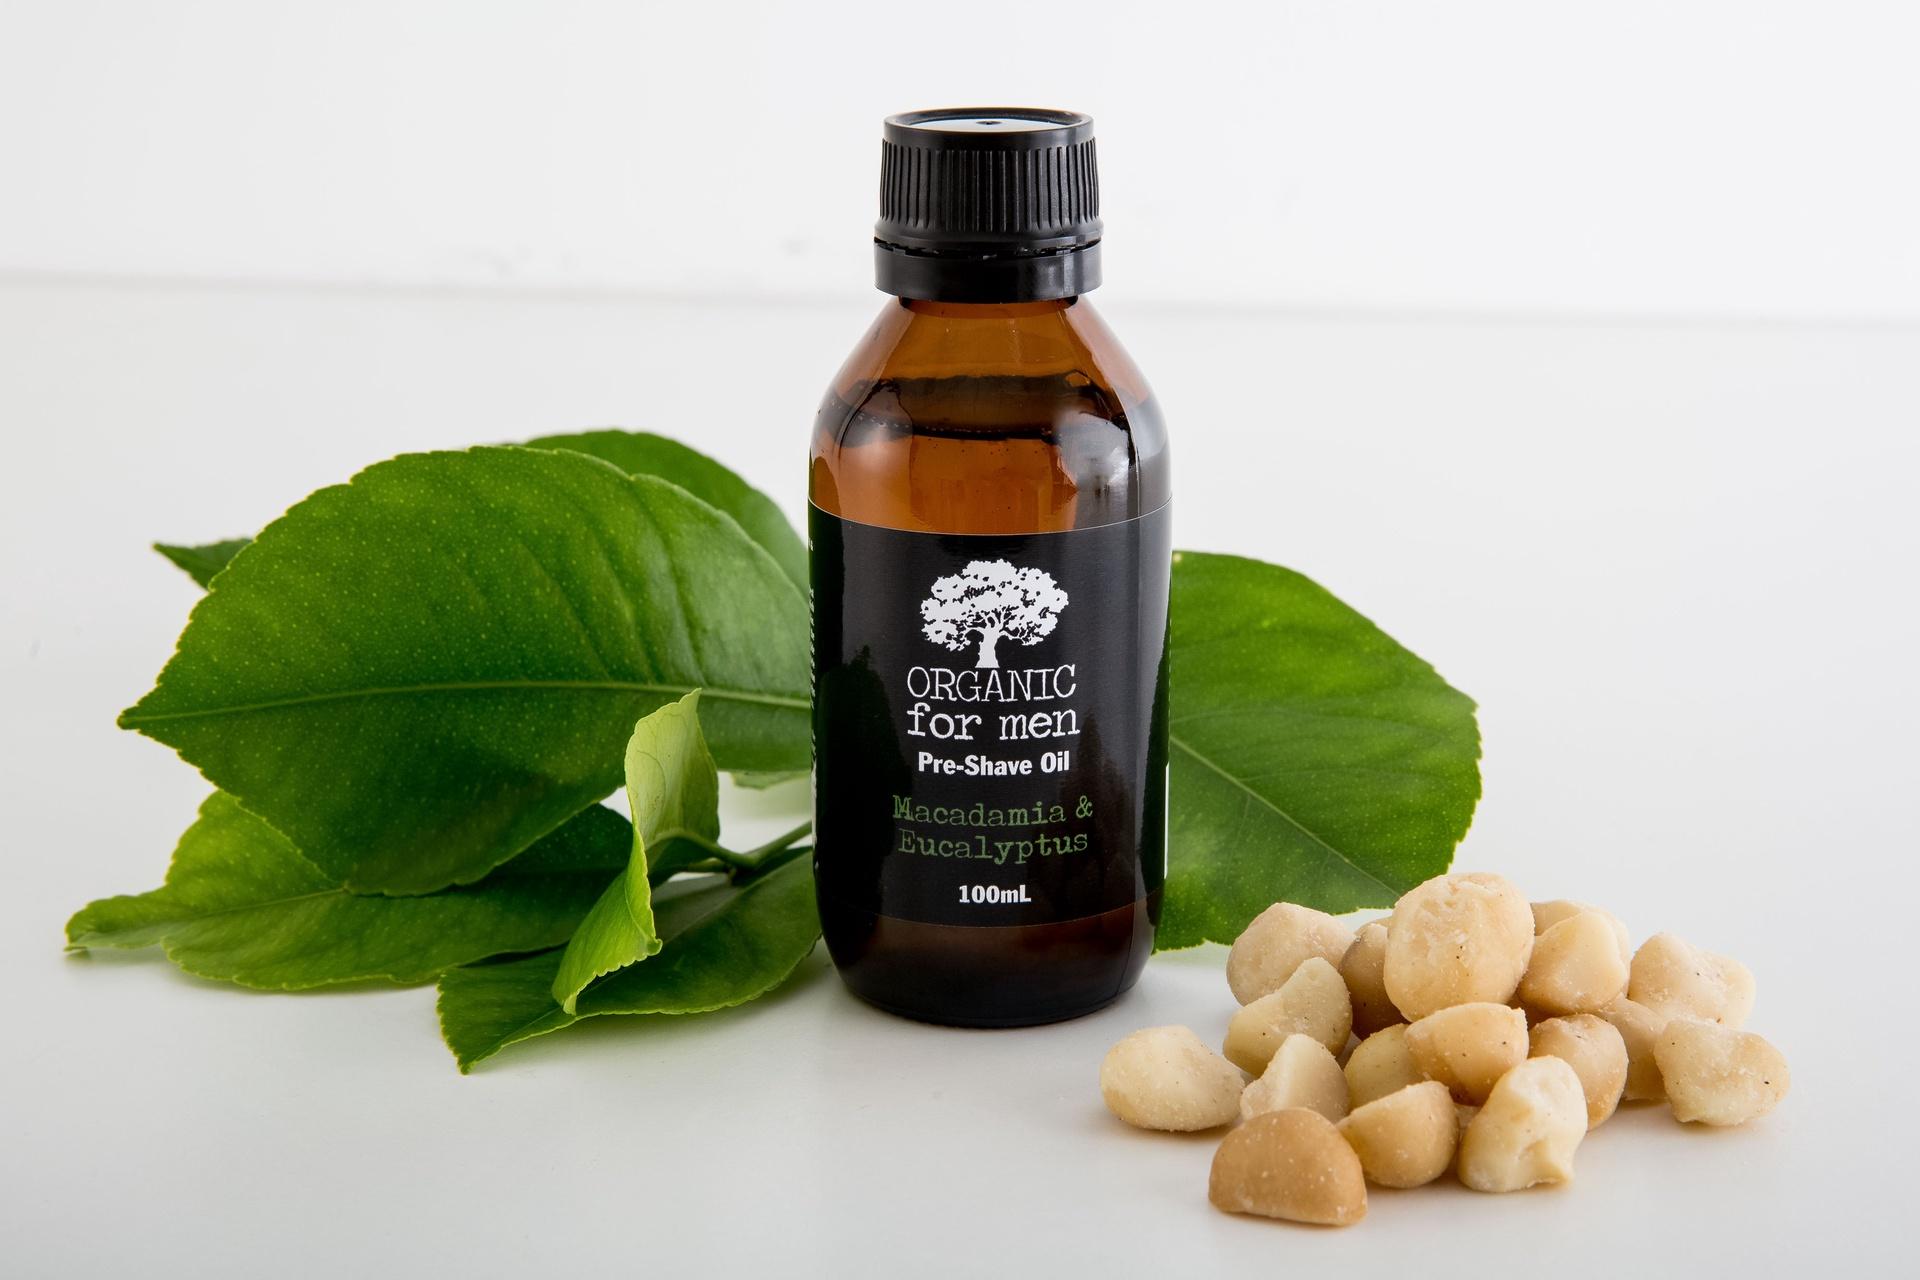 Organic for Men - Pre-shave Oil